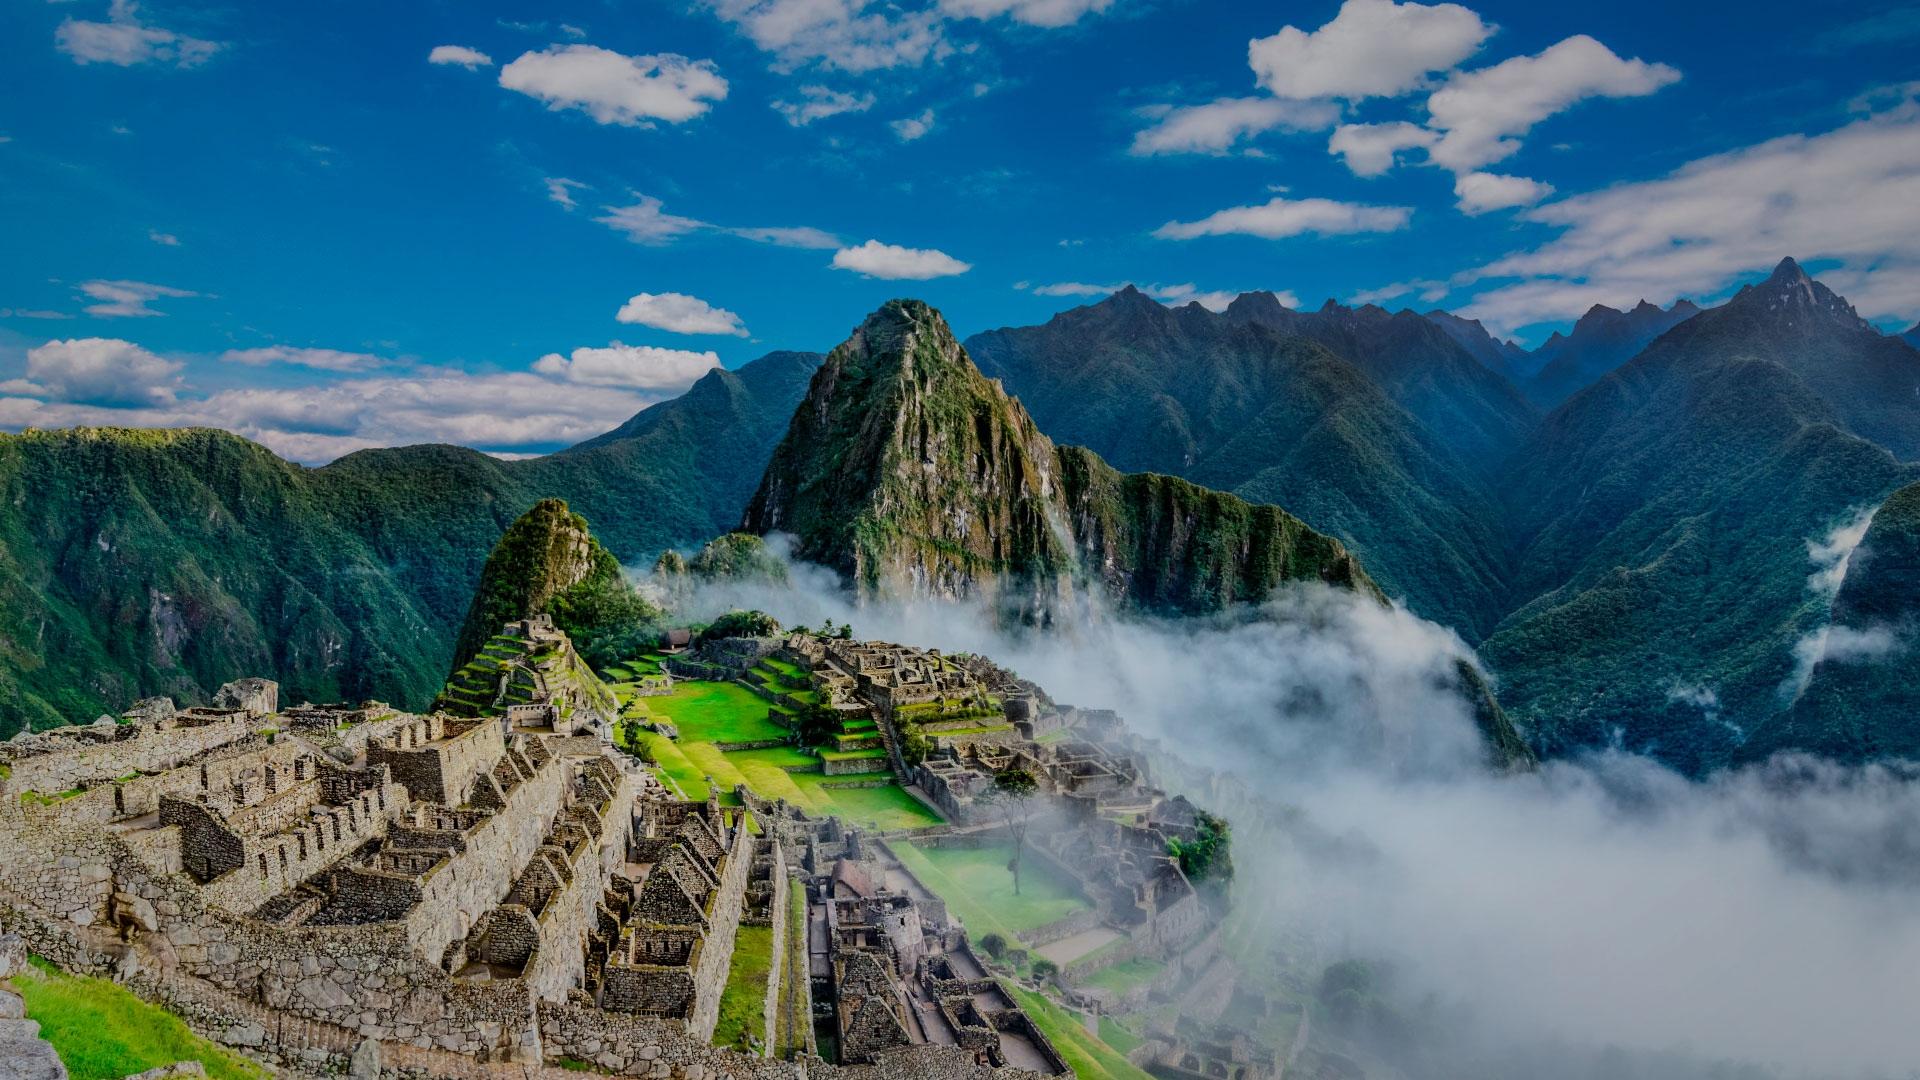 https://www.centraldevacaciones.pt/viajes/assets/upload/c5.jpg